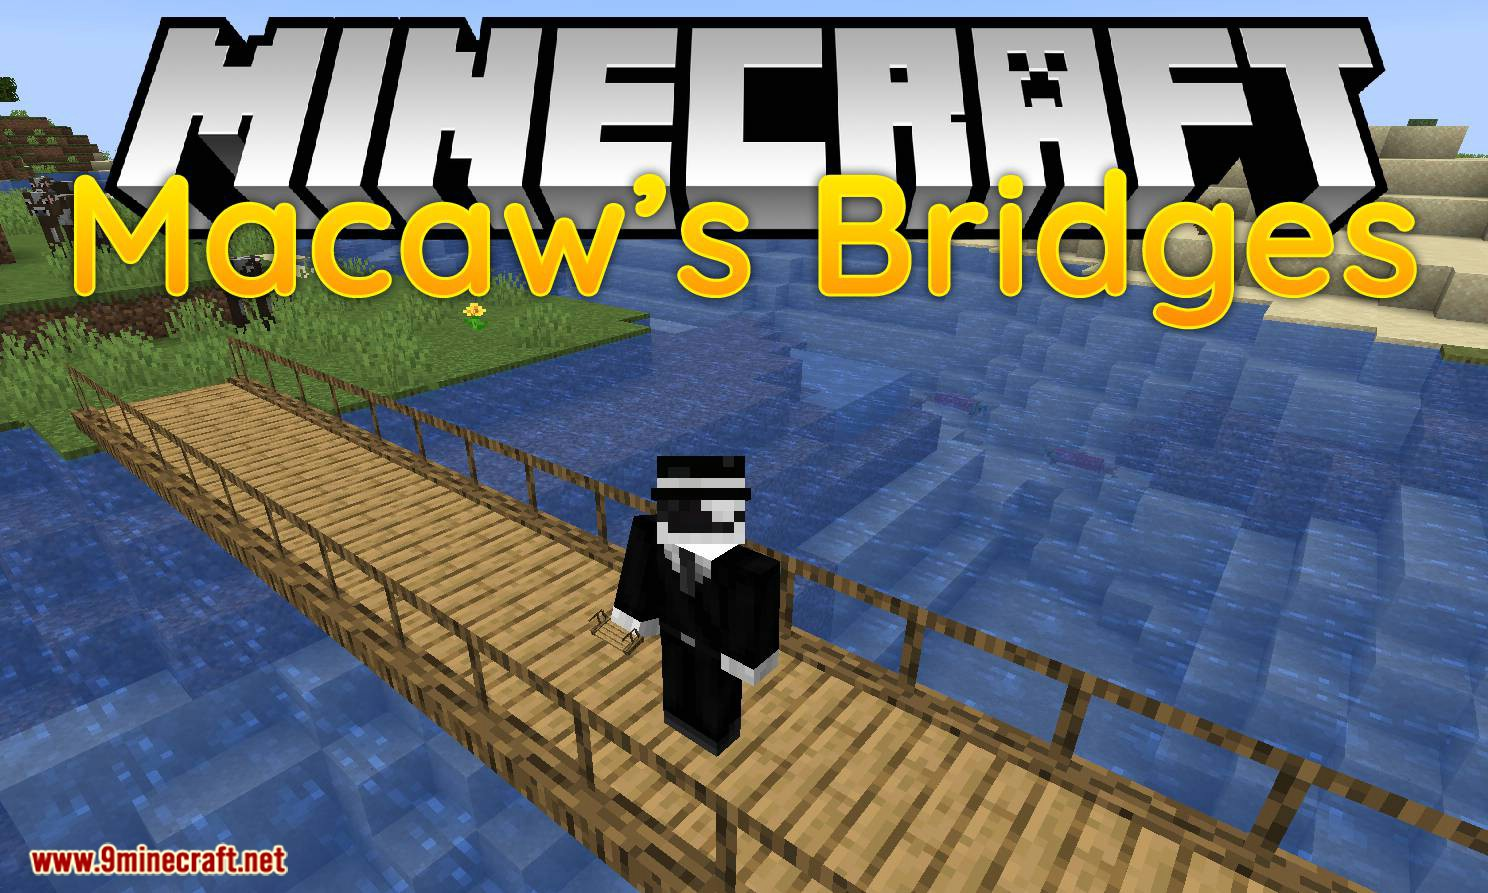 Macaw_s Bridges mod for minecraft logo